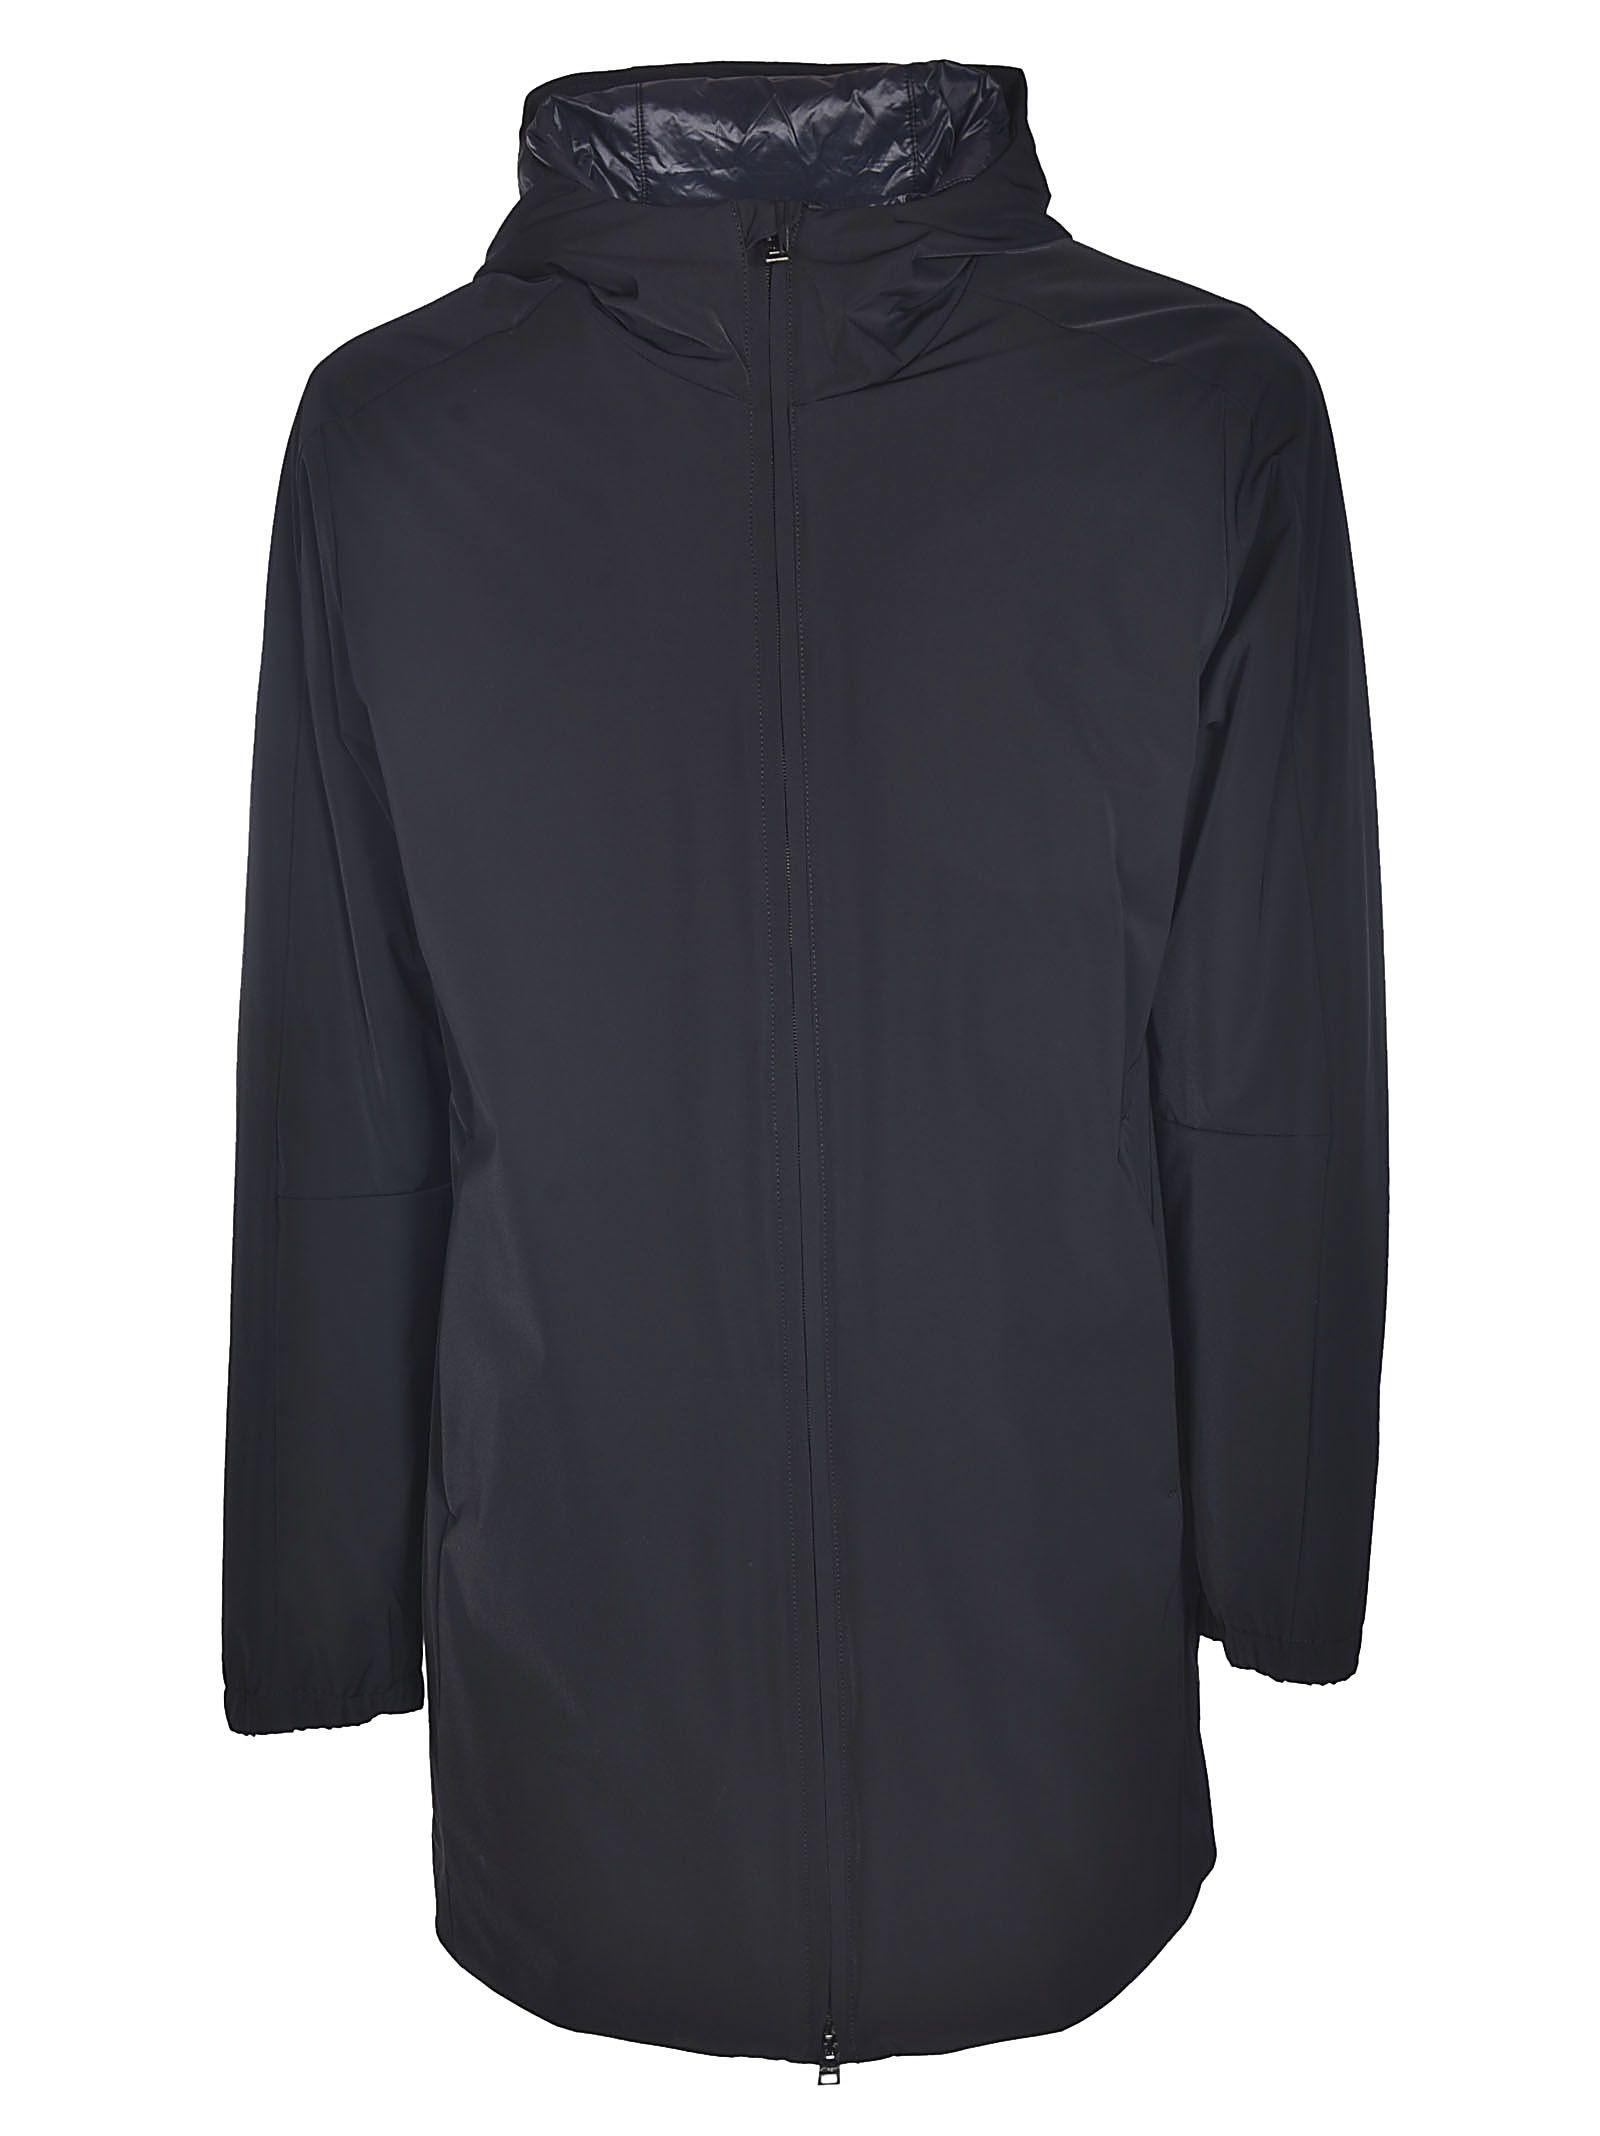 ALLEGRI High Neck Long Jacket in Black